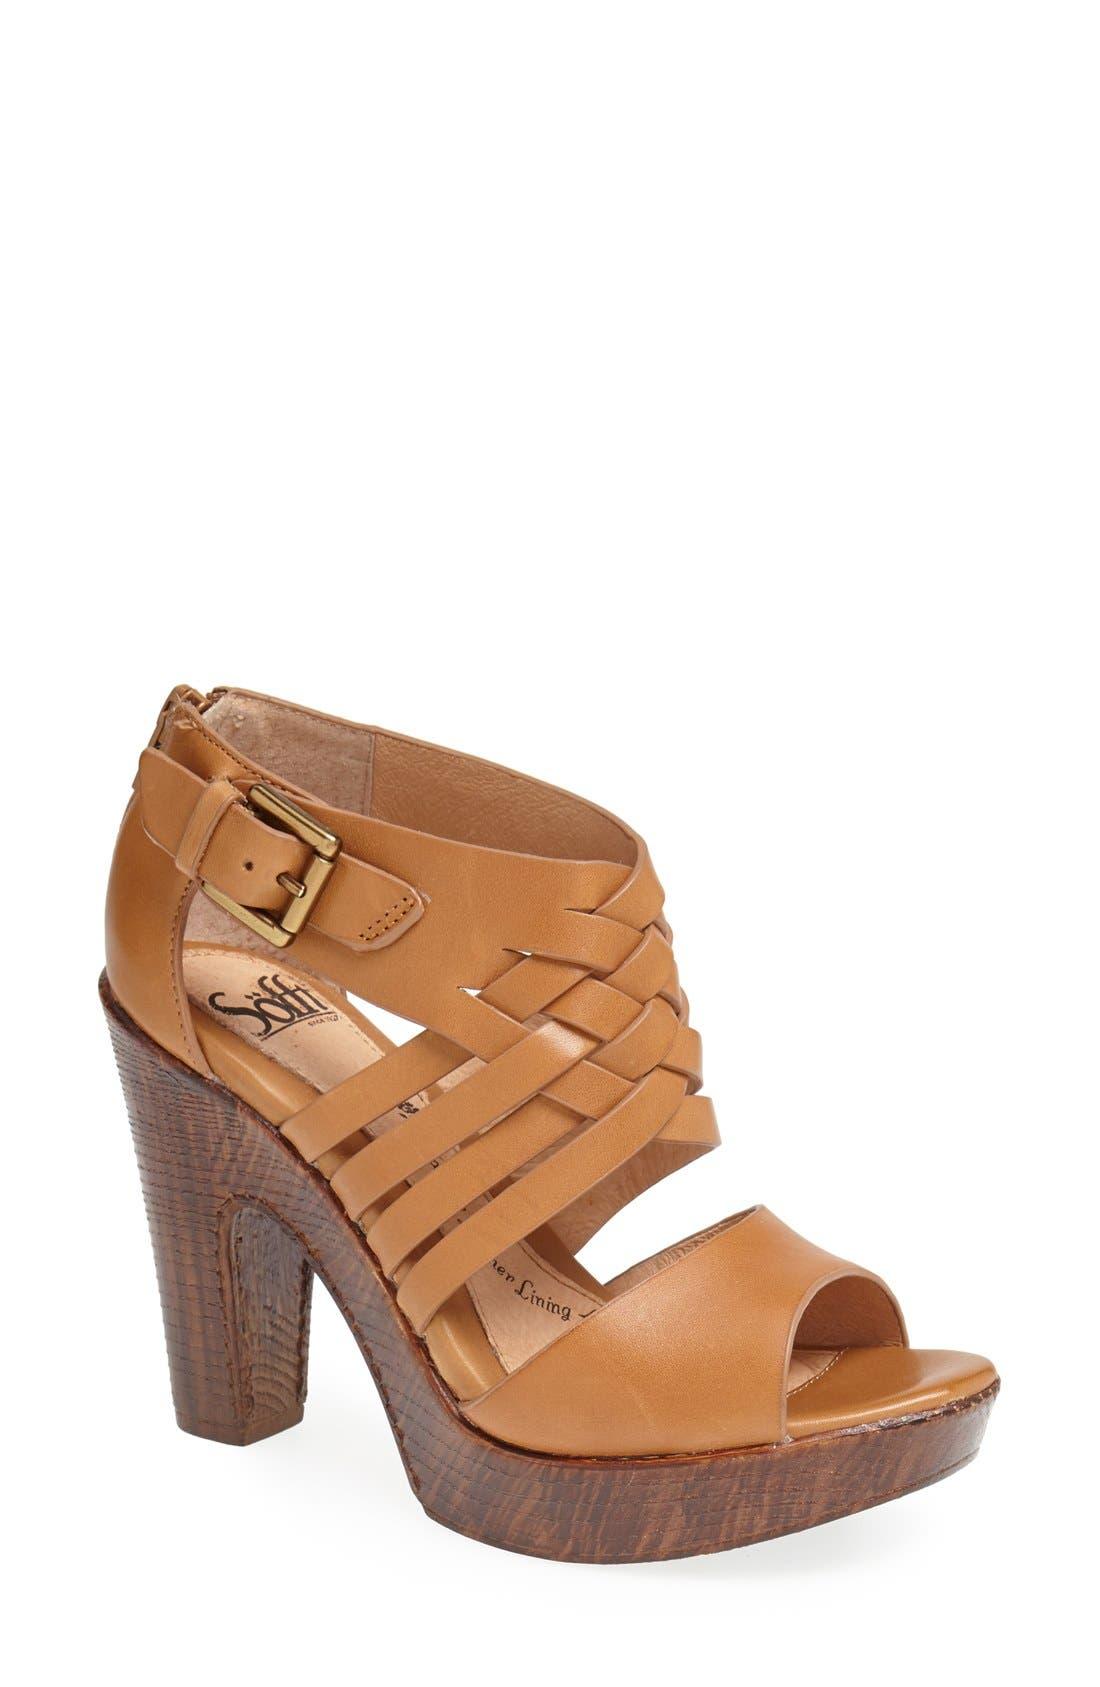 Alternate Image 1 Selected - Söfft 'Ohanna' Leather Sandal (Women)